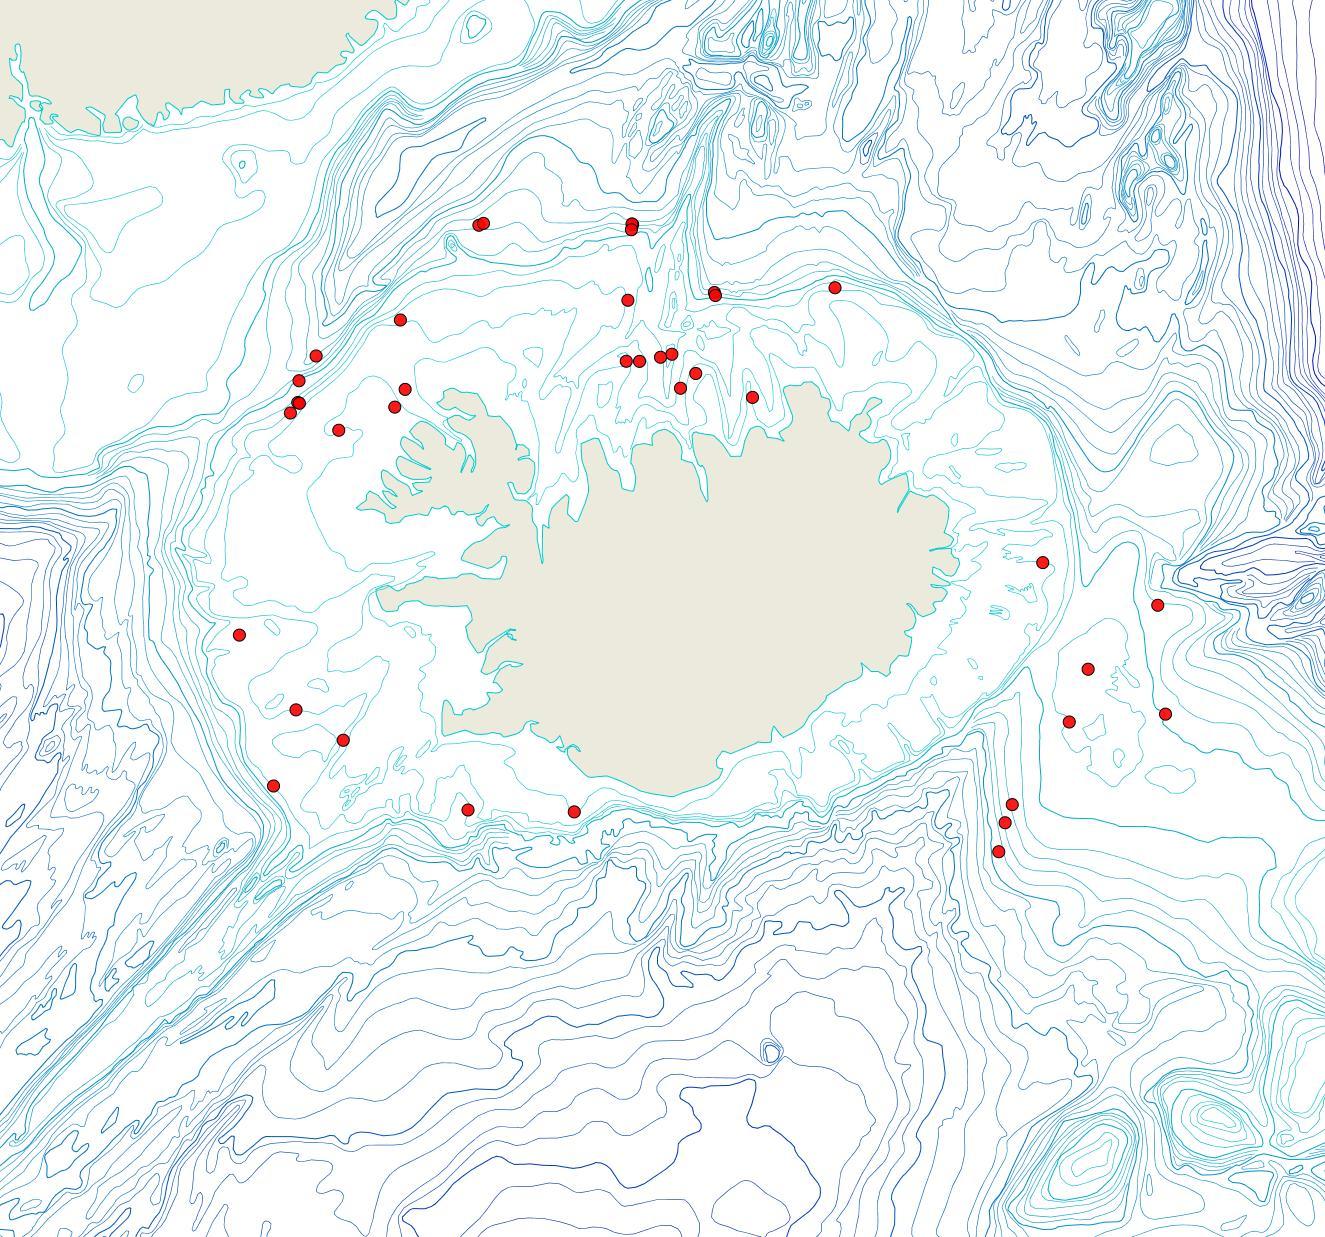 Útbreiðsla Diplosolen obelium(Bioice samples, red dots)